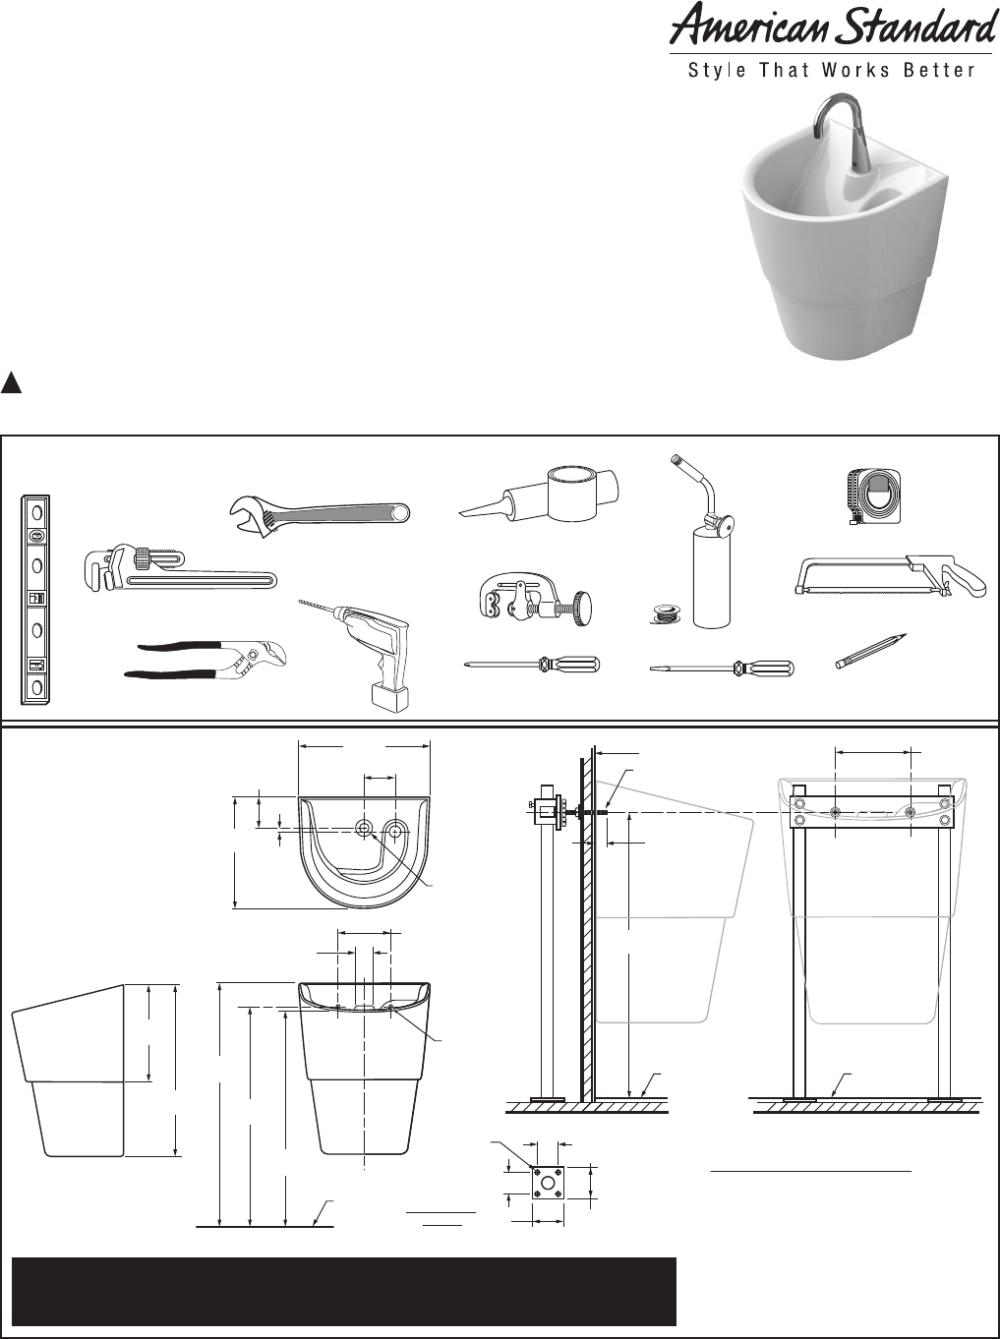 medium resolution of american standard 9118 1 9118 111 9118 15 icu sink system installation instructions